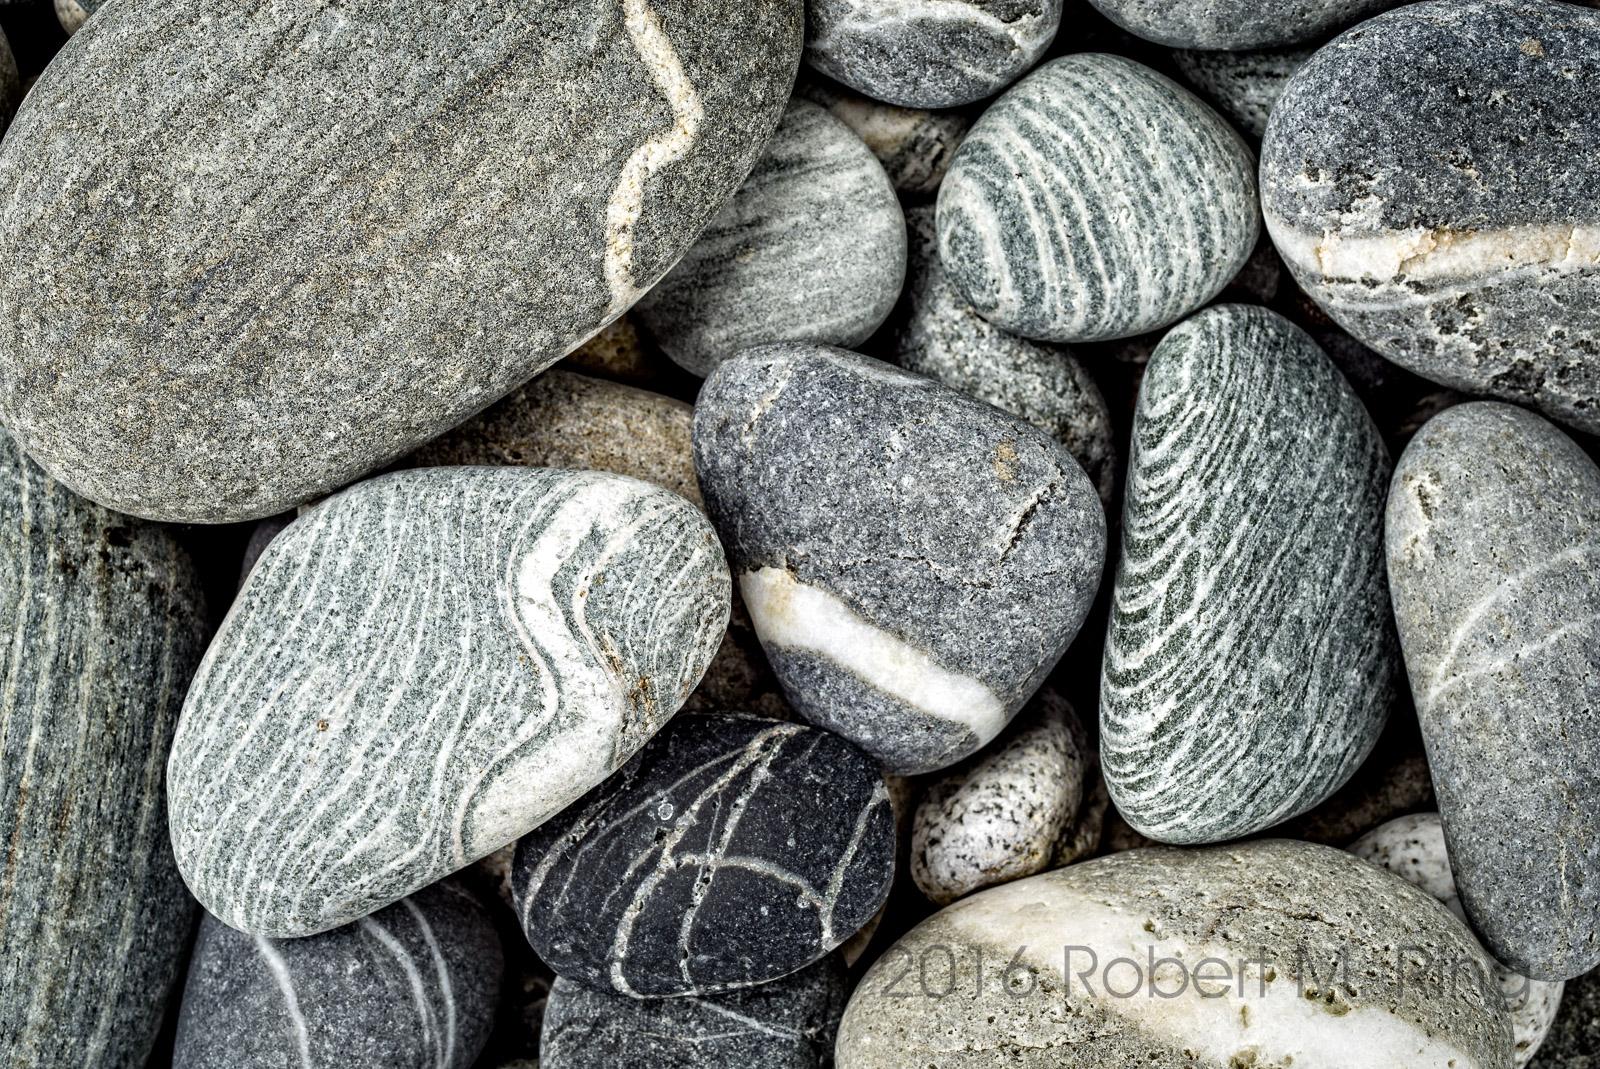 Maine, coast, rocks, new england